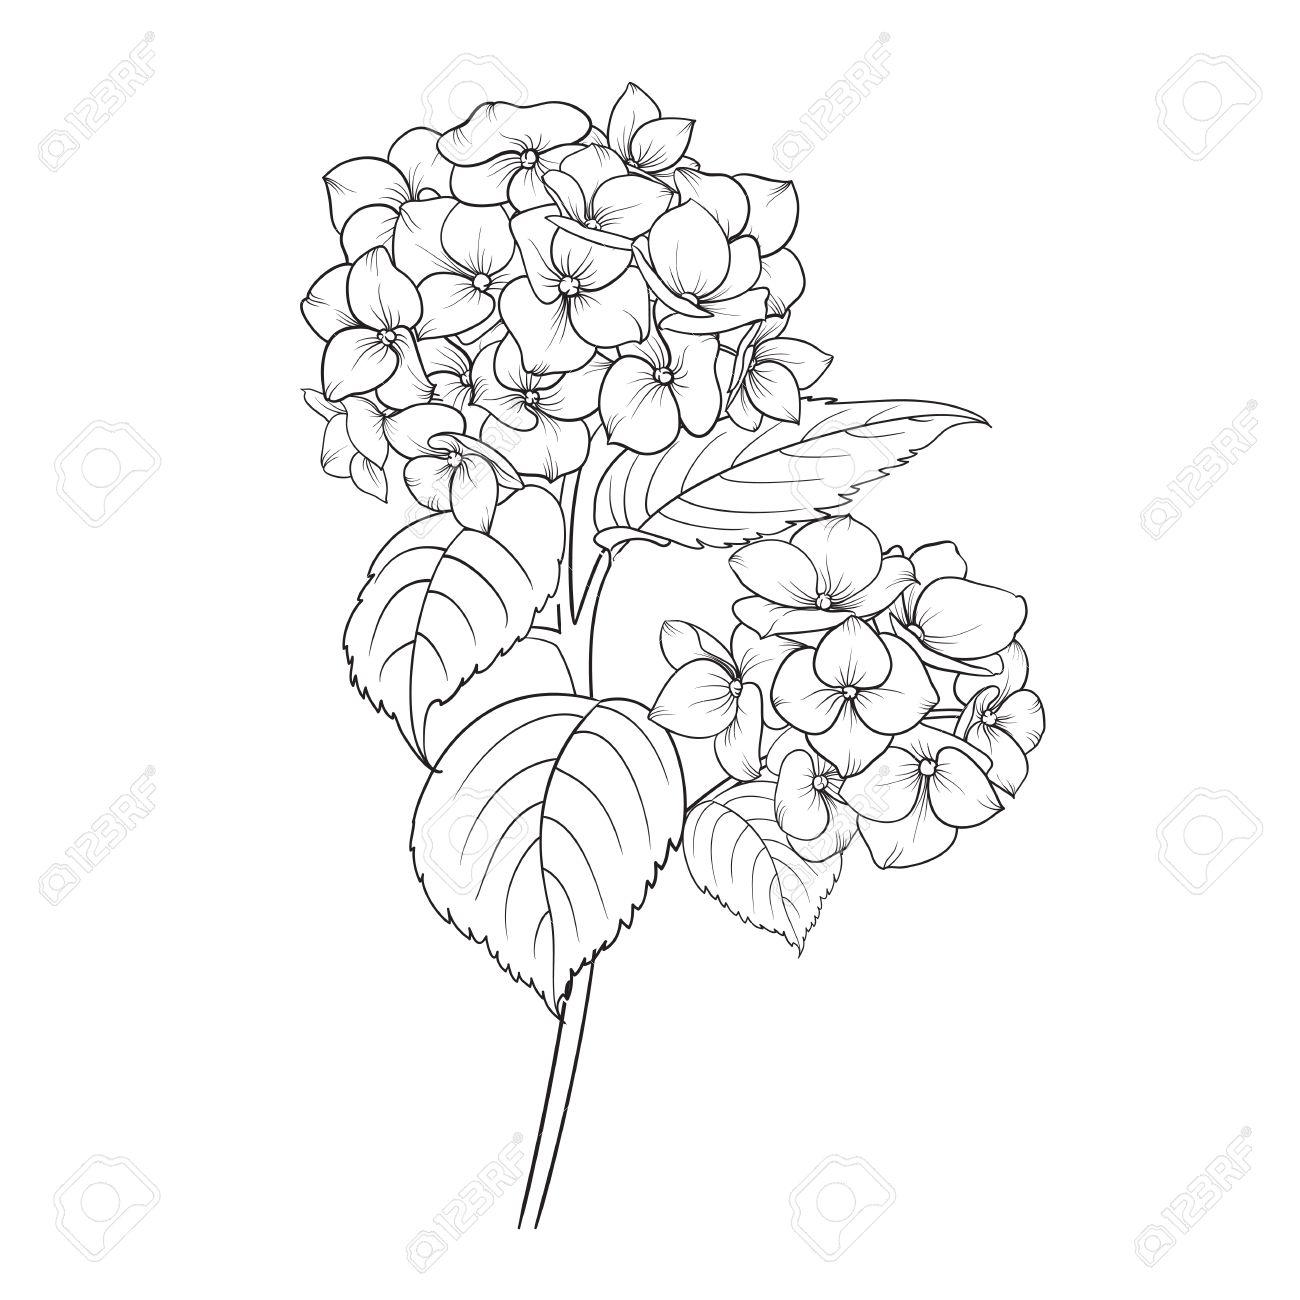 Blooming Fleur D Hortensia Sur Fond Blanc Tete De Balai Fleur D